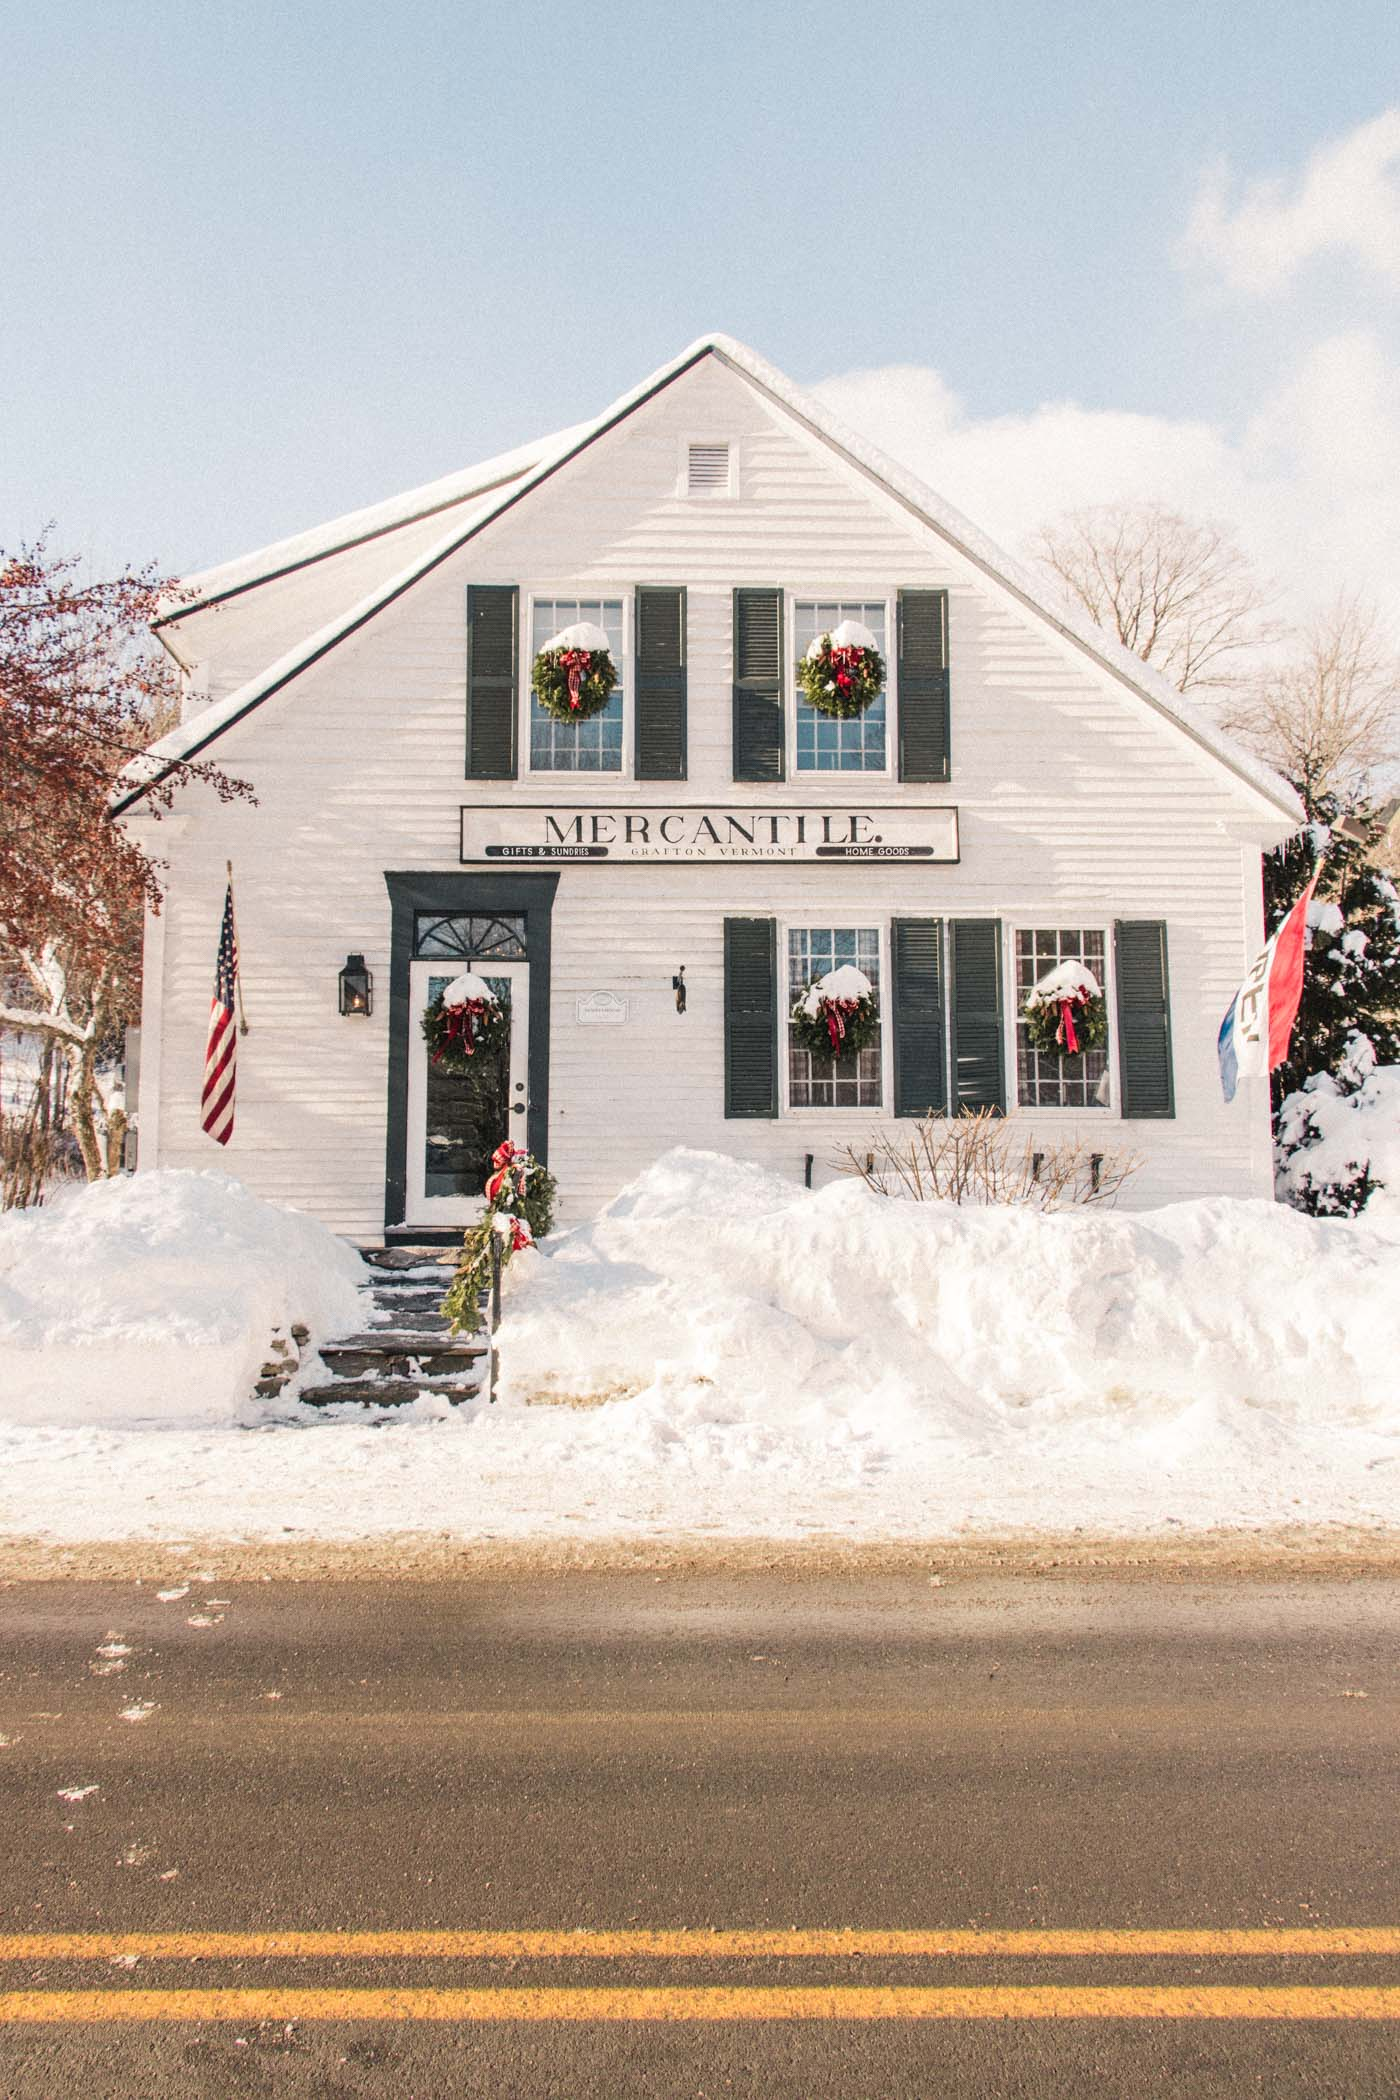 Mercantile: Antique Store in Grafton, Vermont - Simply Lovebirds